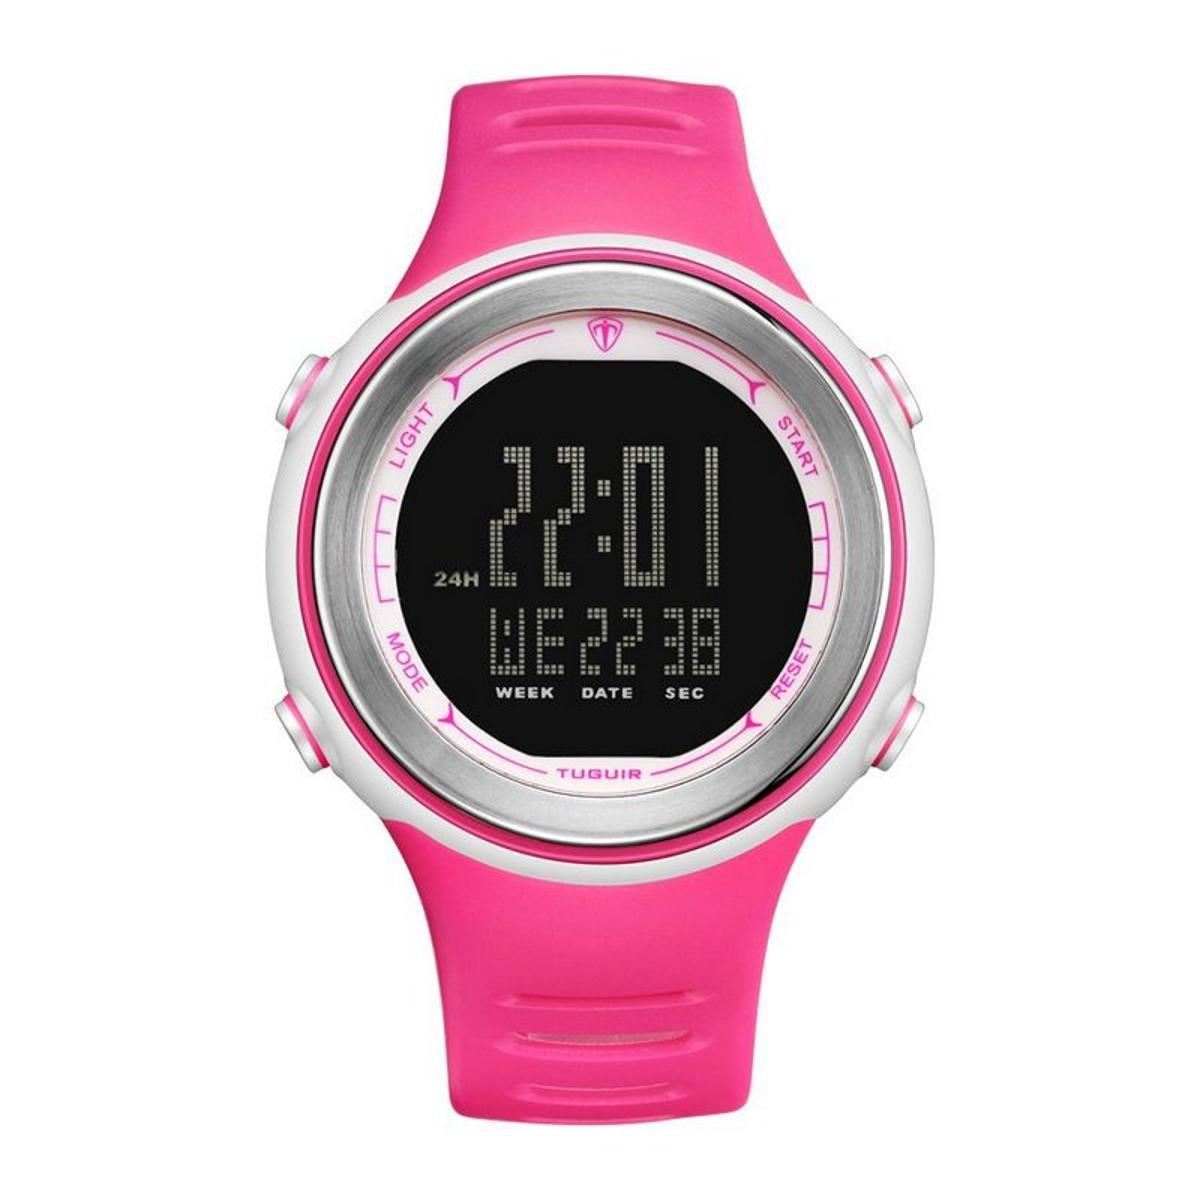 9b041f34eee Relógio Romaplac Tuguir Digital - Rosa - Compre Agora